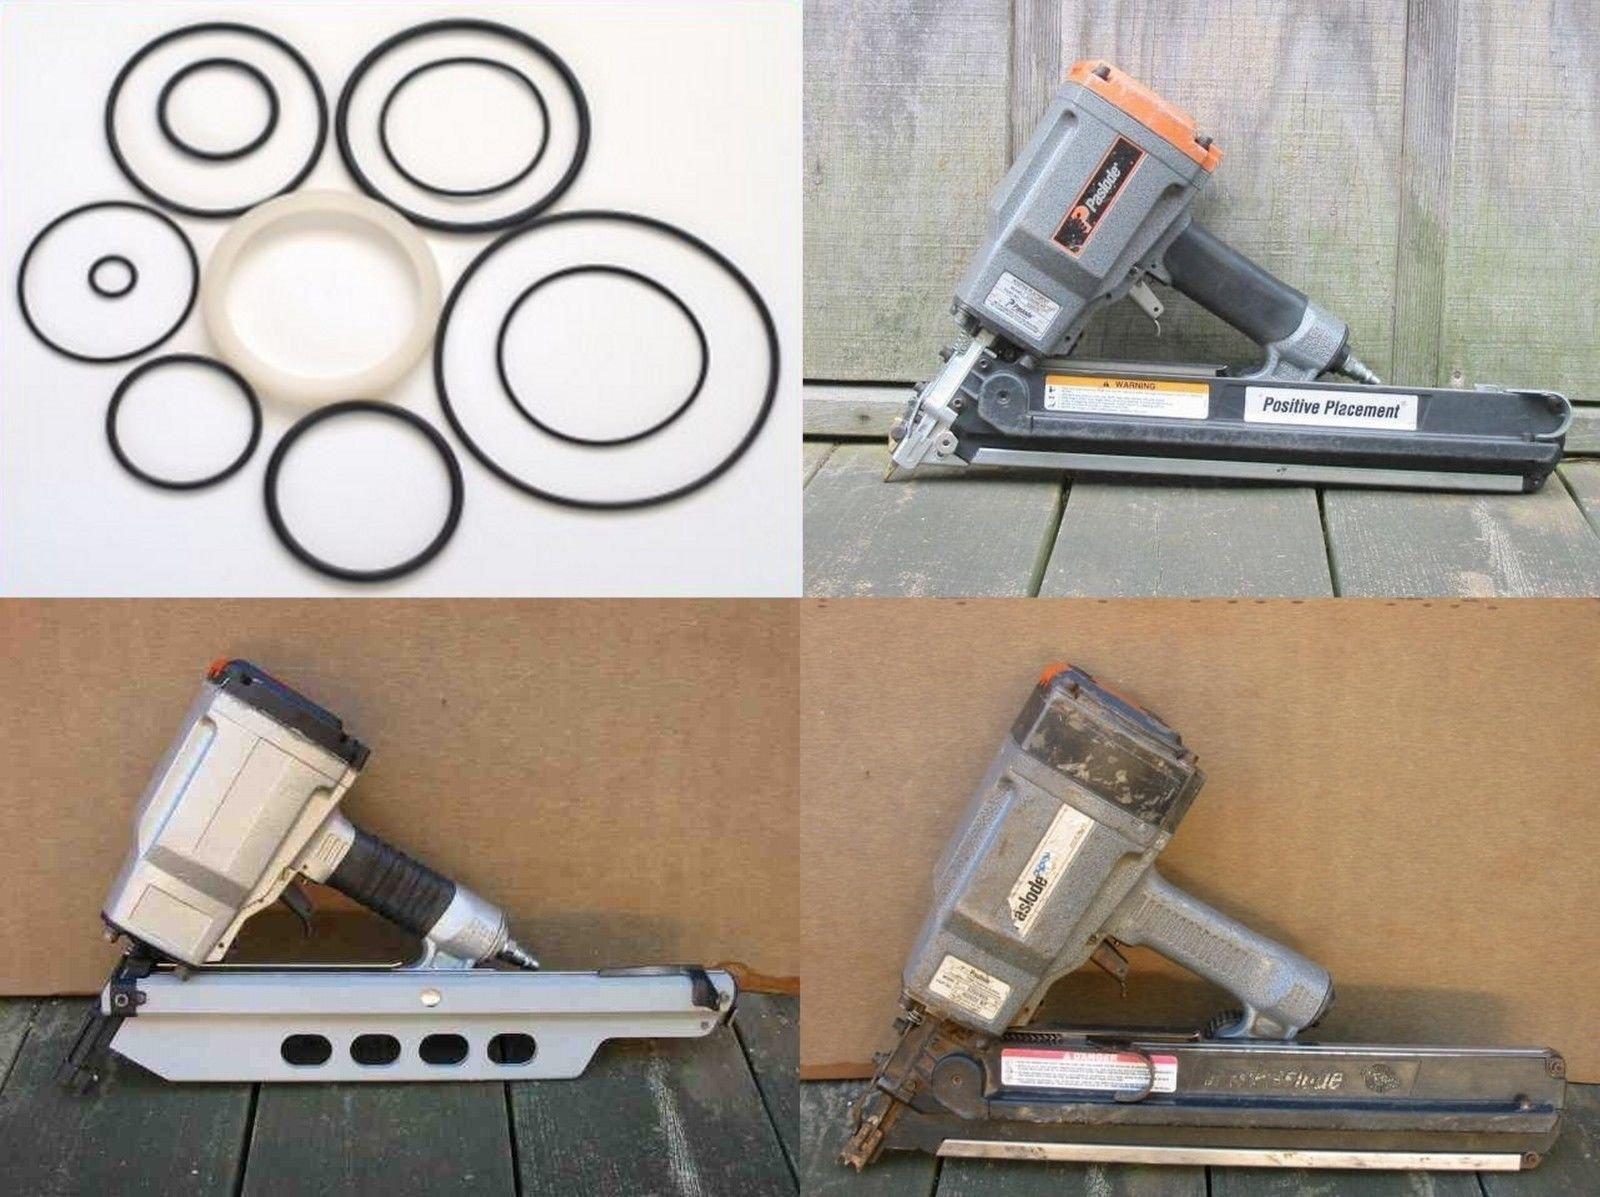 NEW Paslode Framing Nailer Orings + 402011 Kit All 5300 Series 5325/80 5350/90S PM